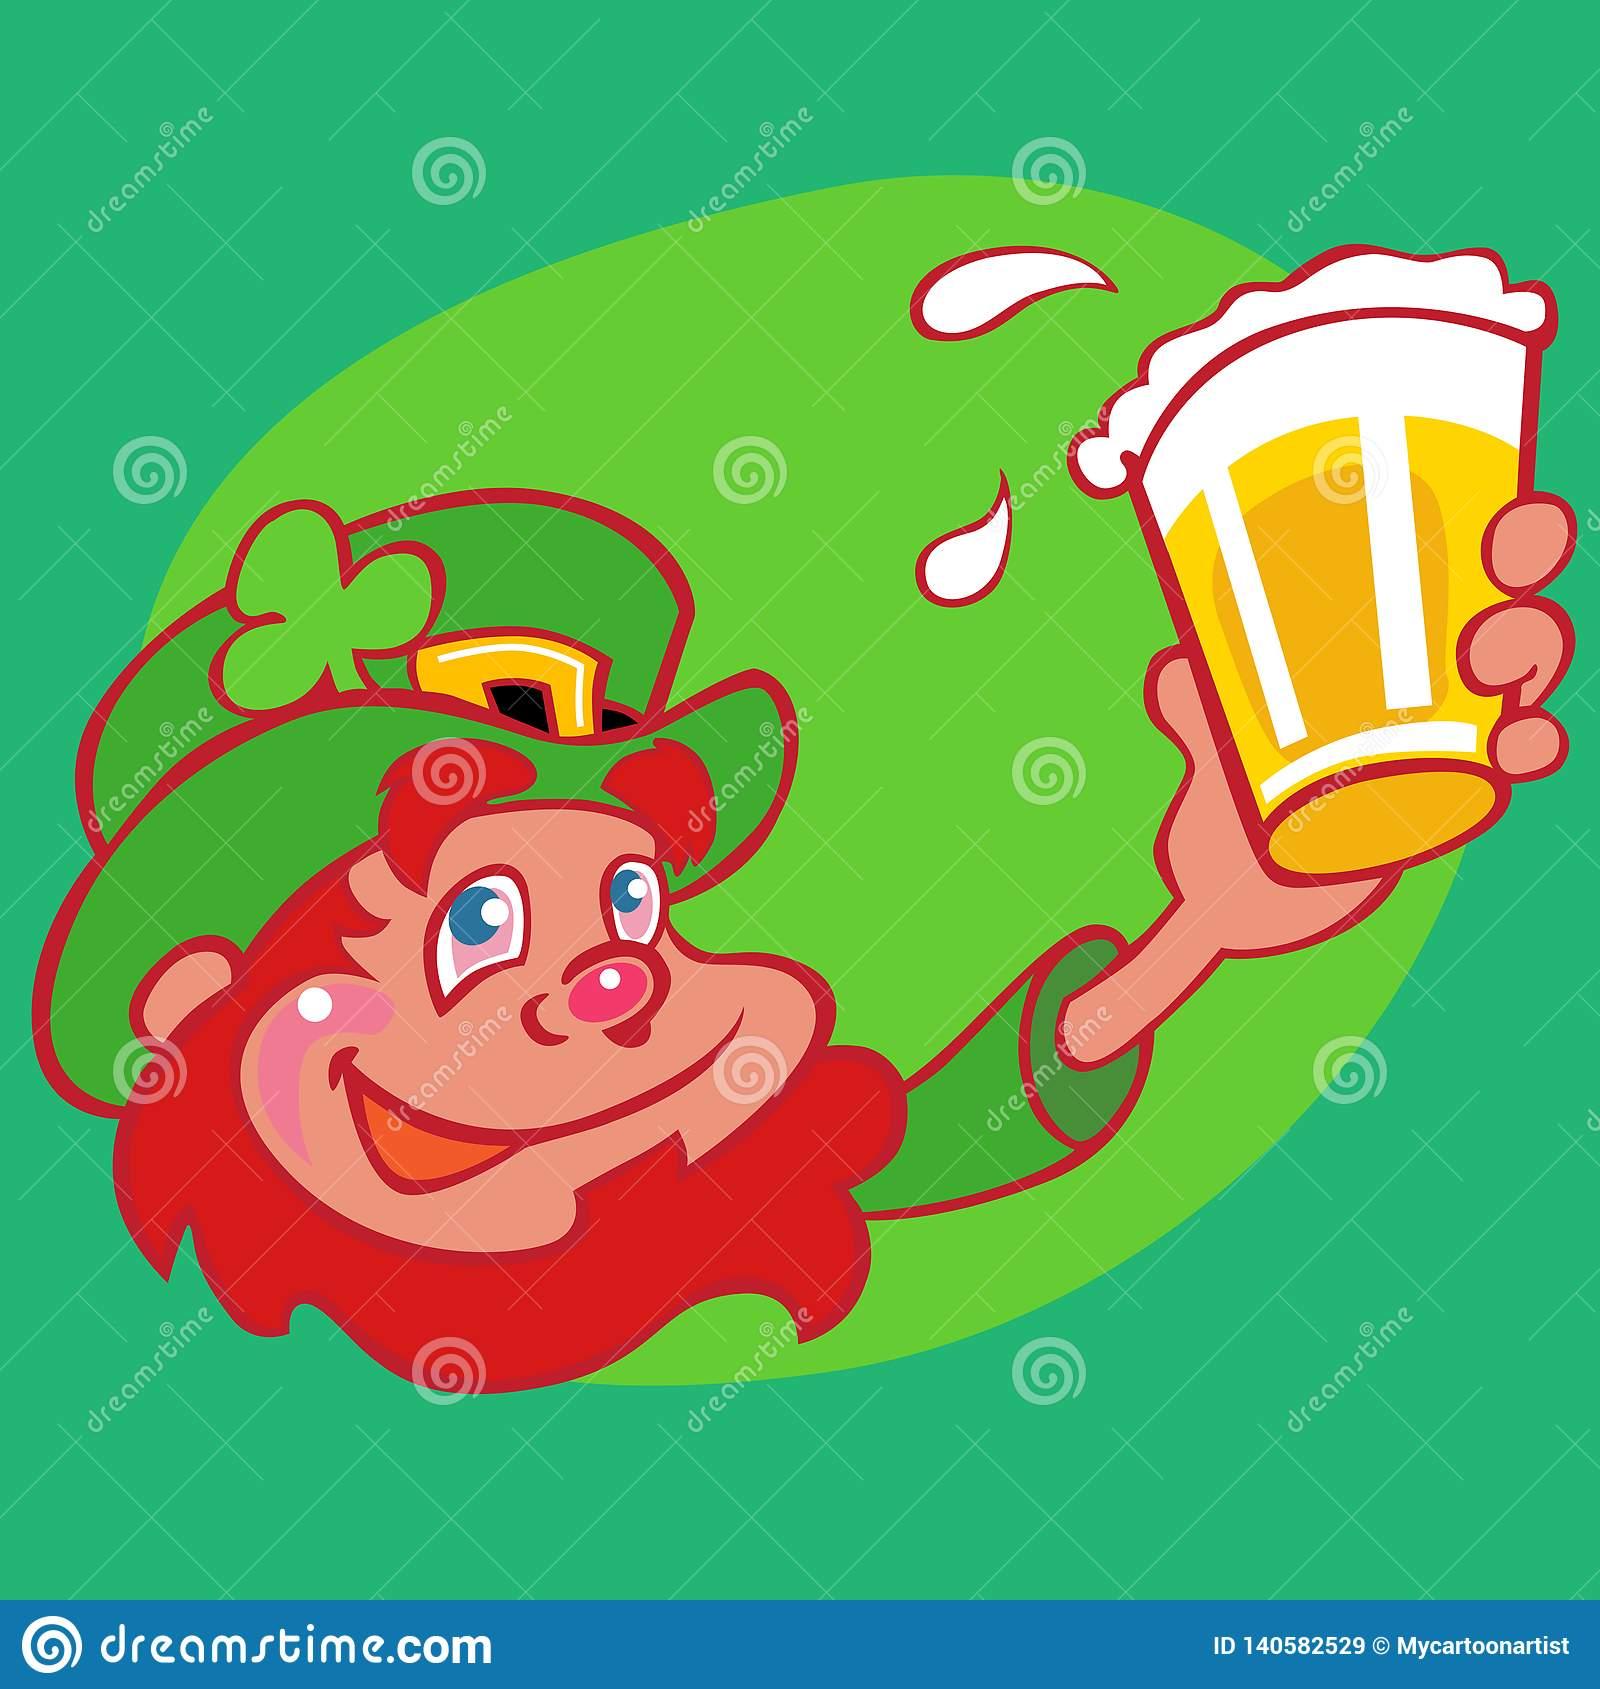 Drunk Leprechaun Red Beard And Beer Stock Image.